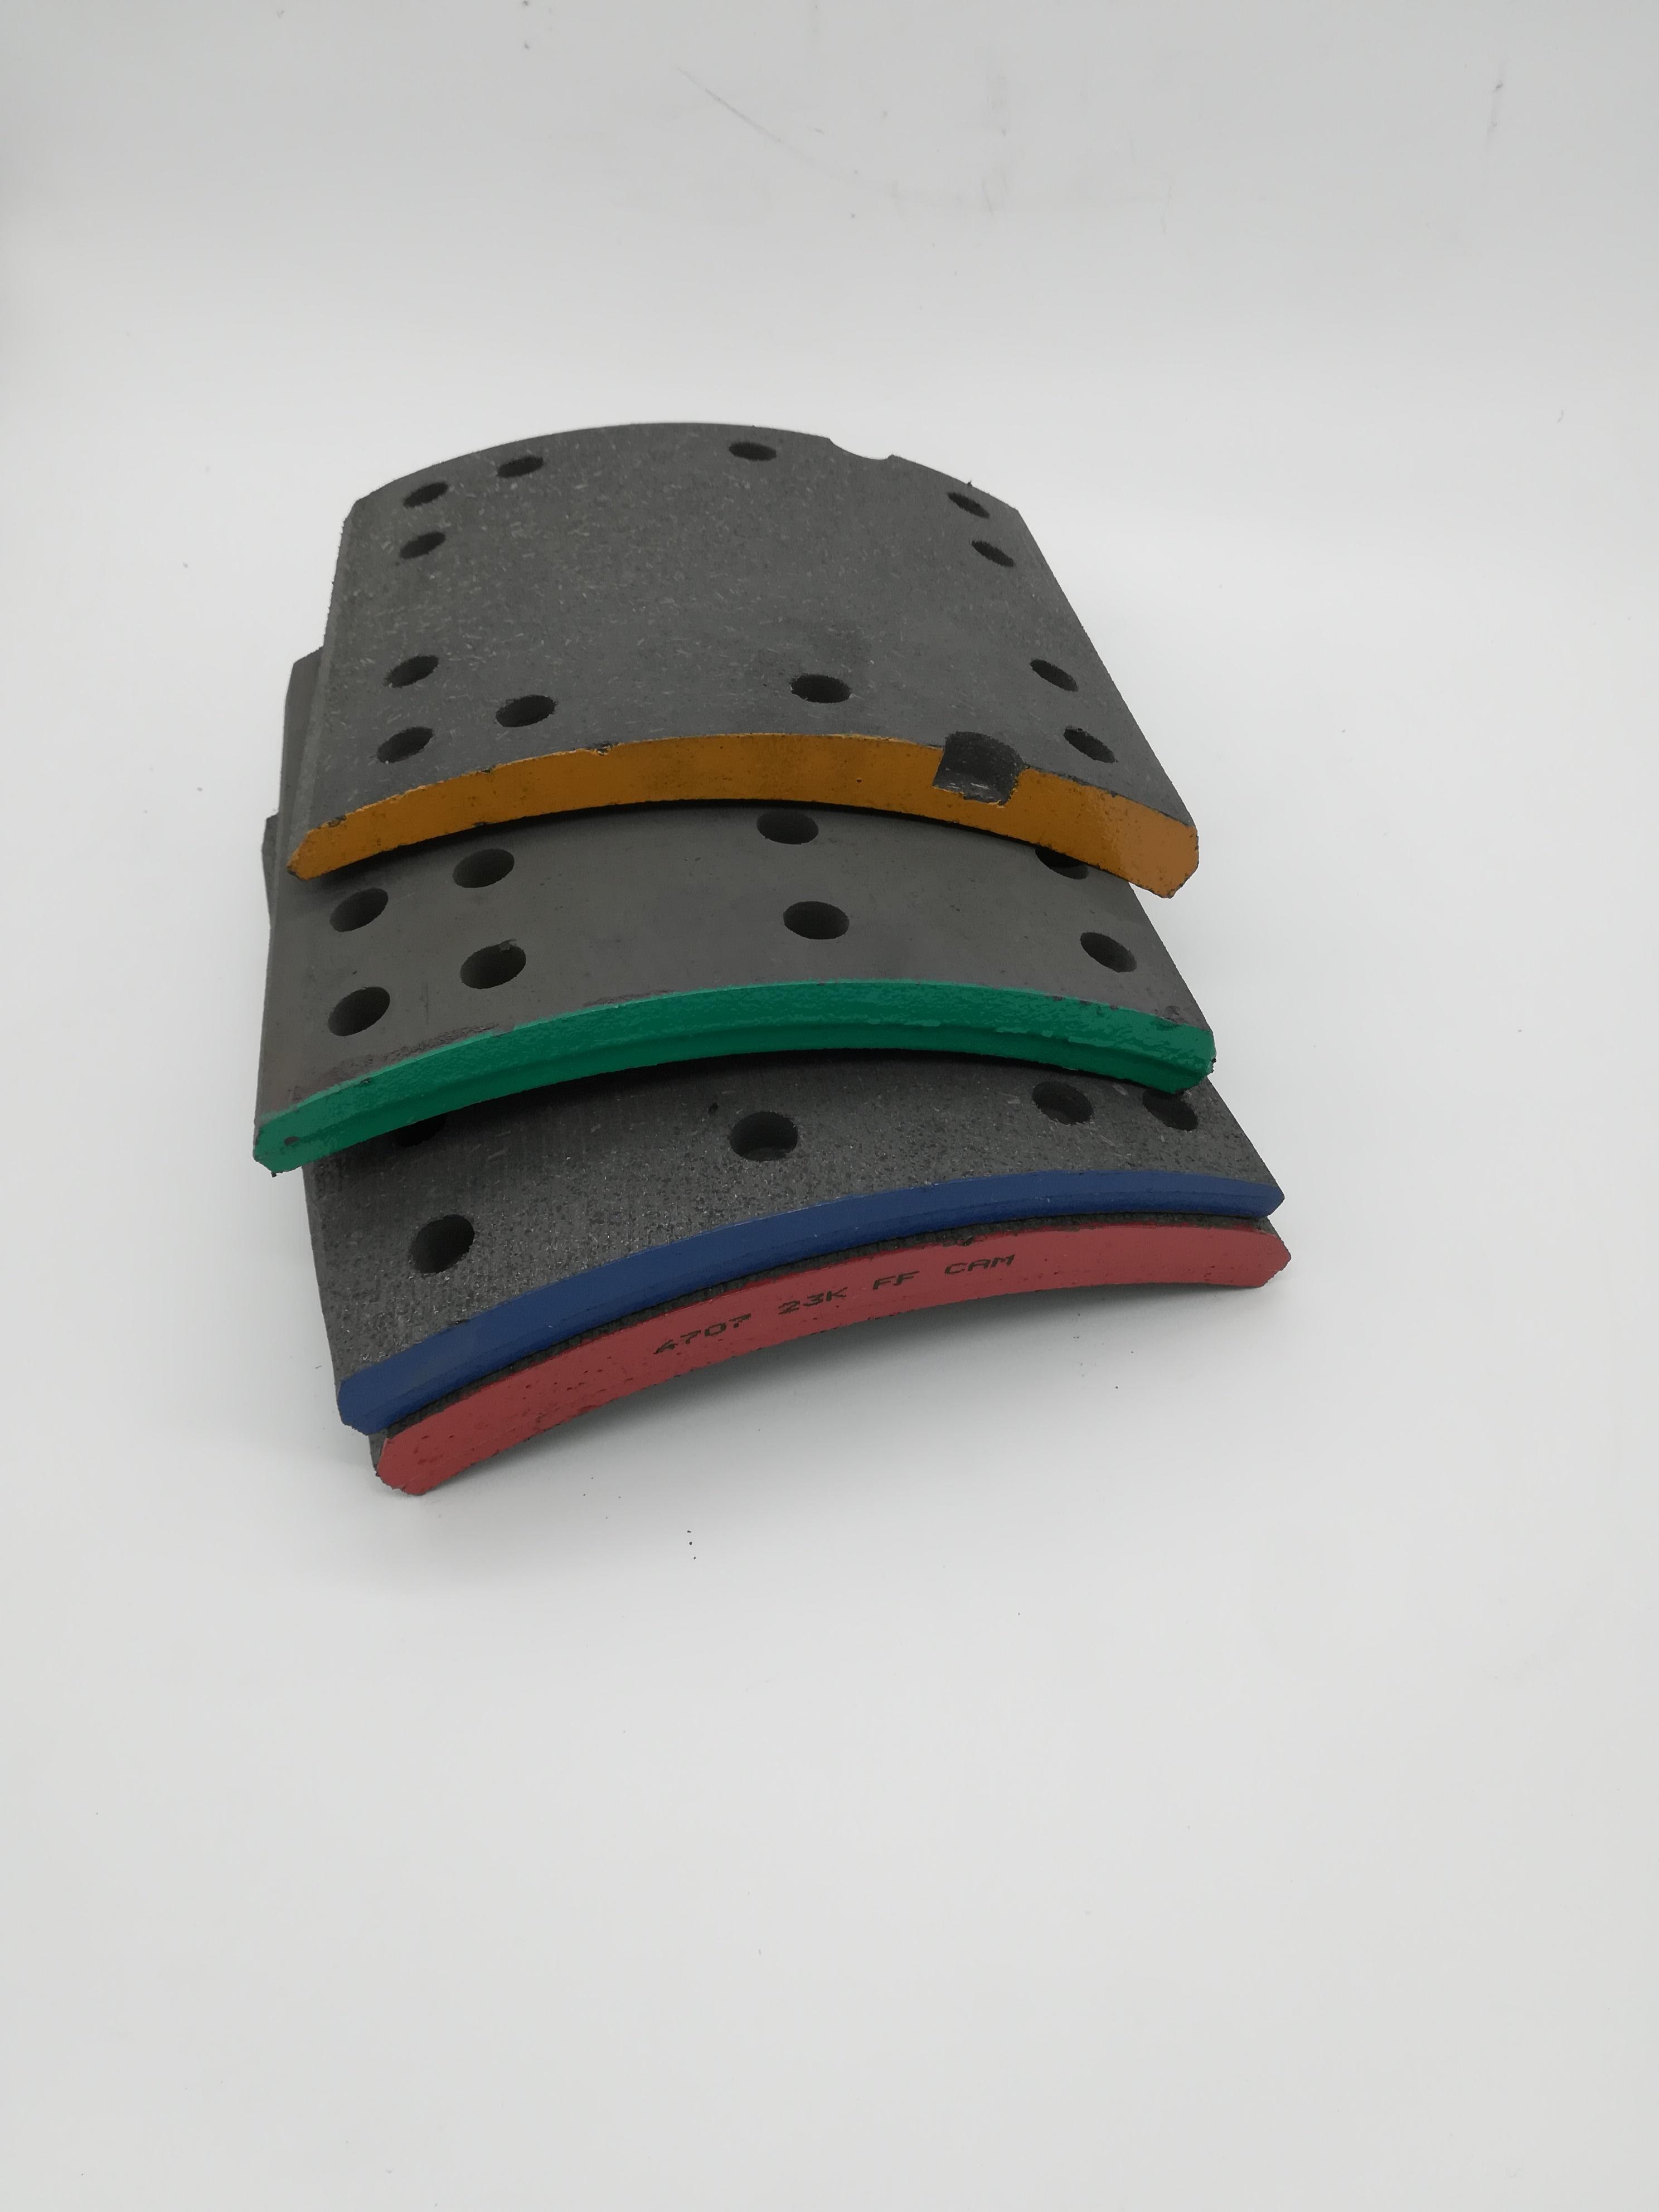 Friction Brake System